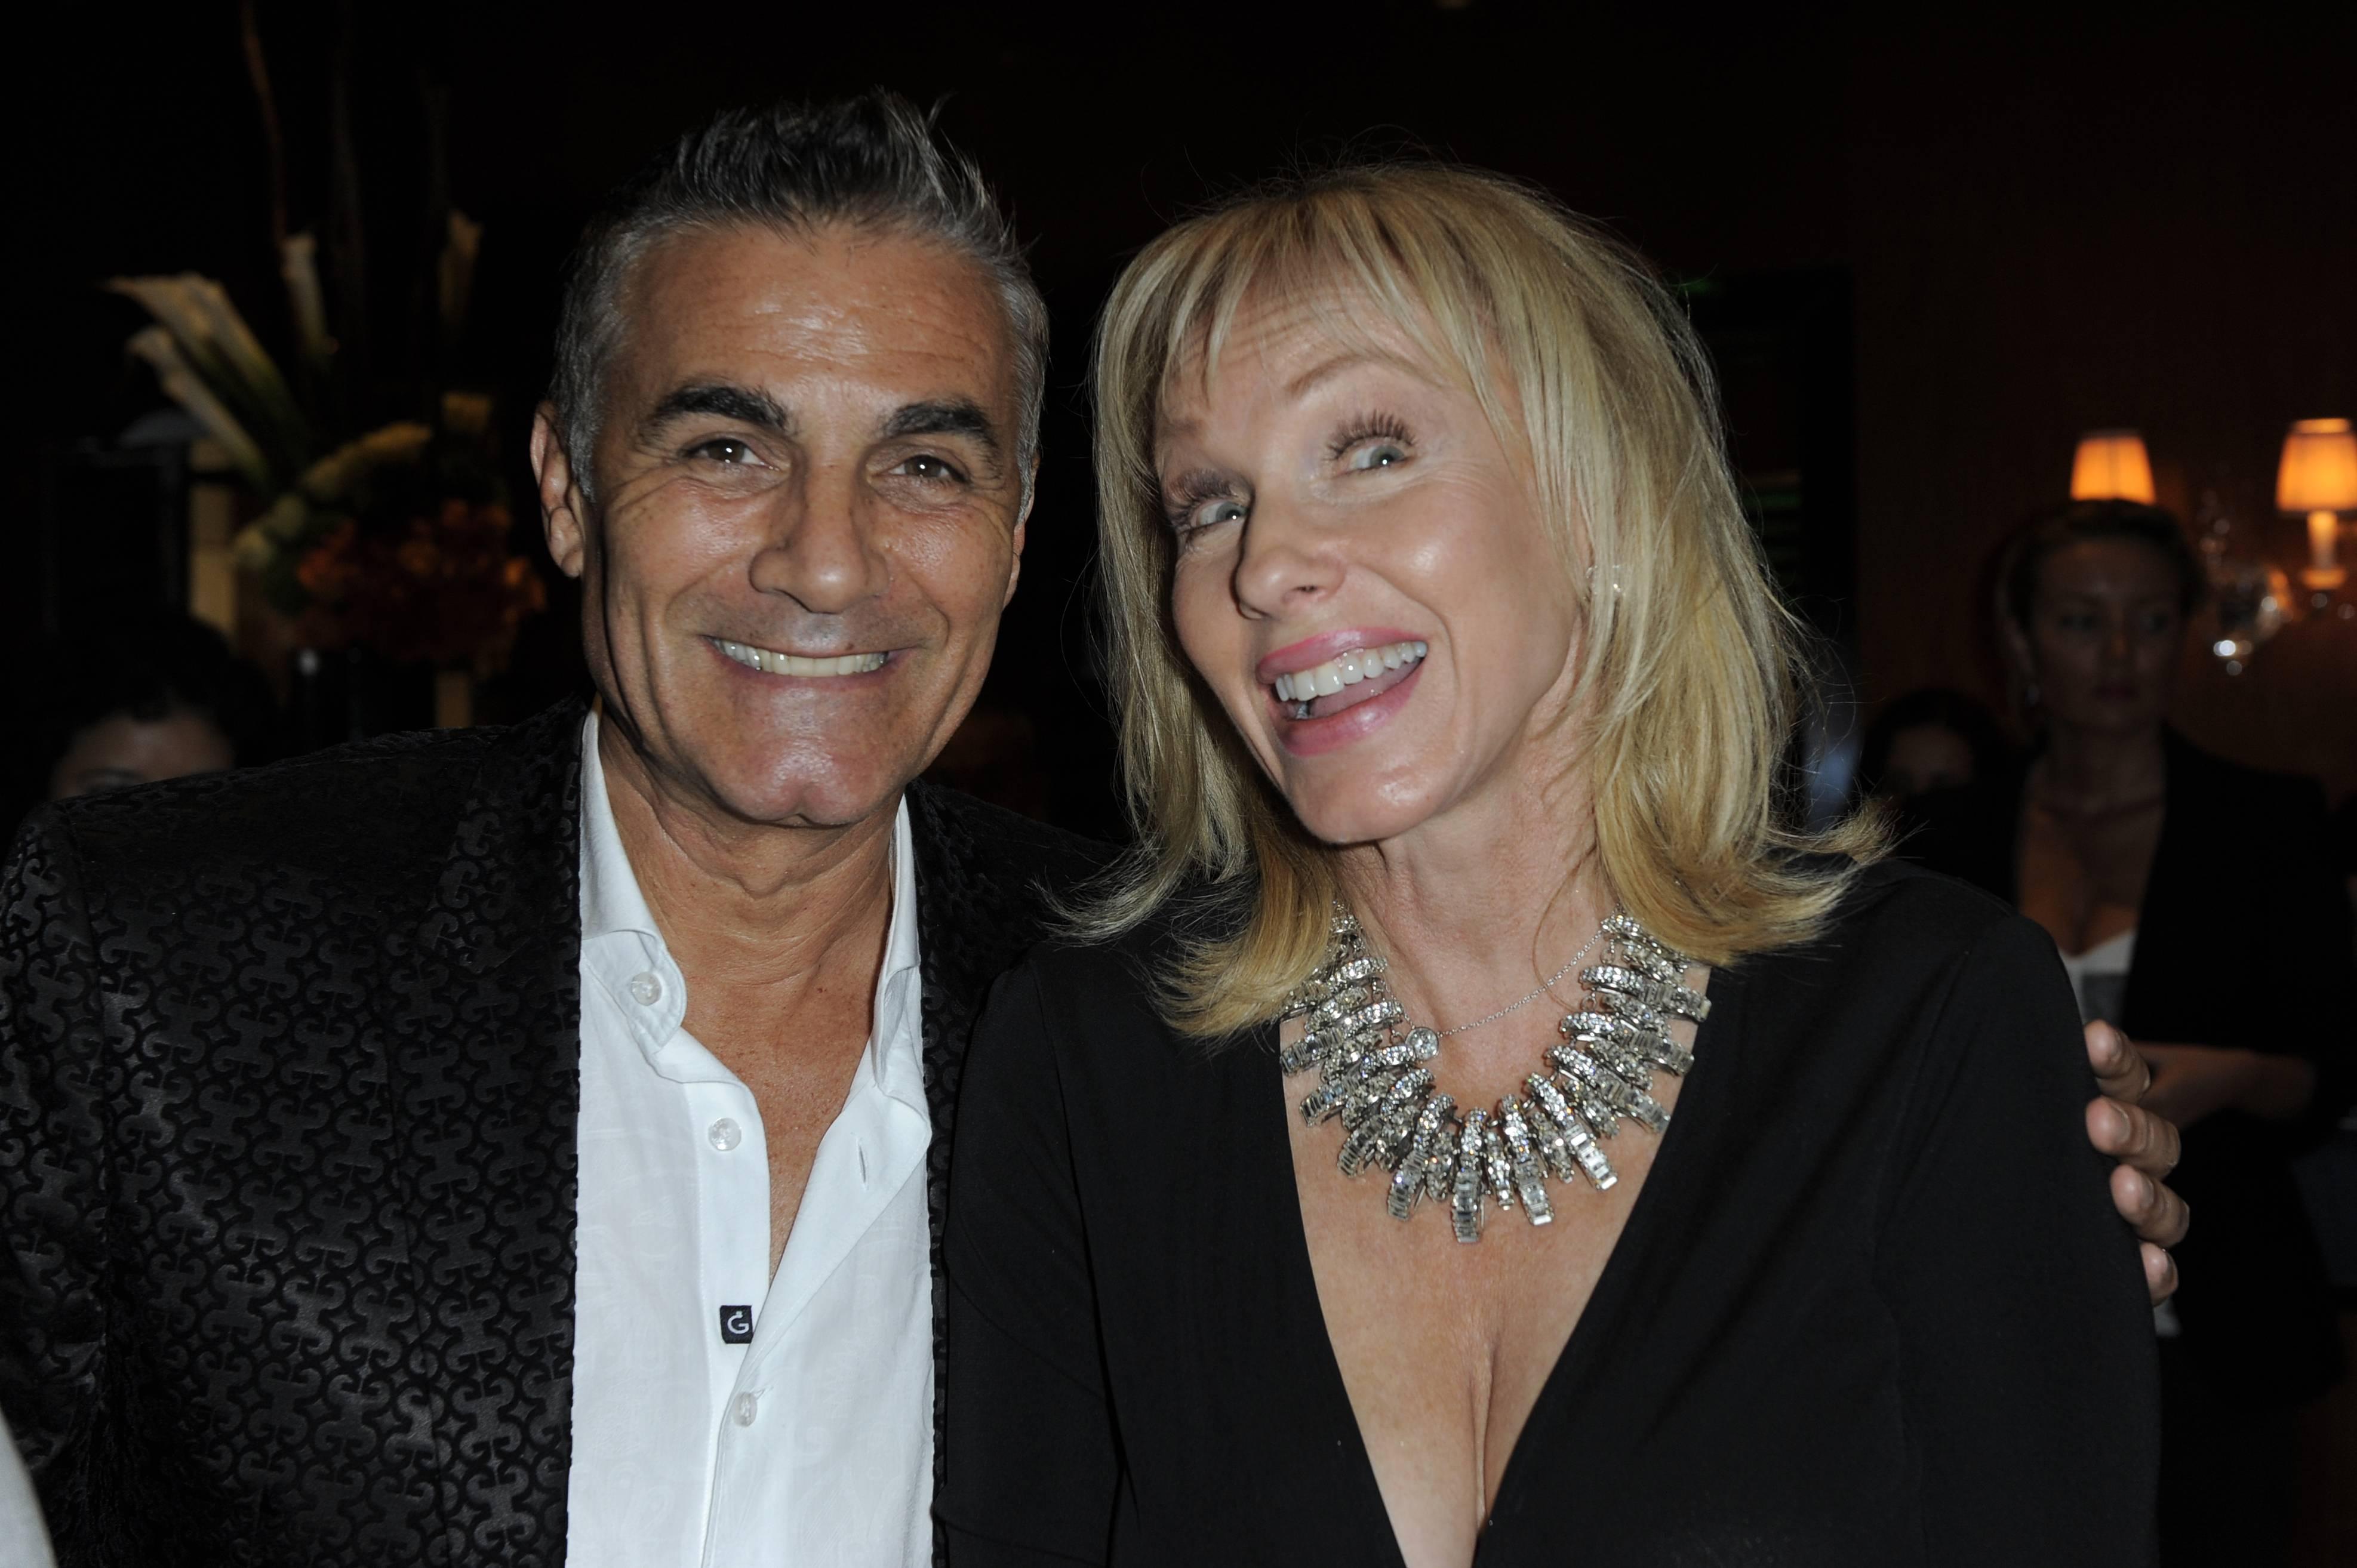 Eric Milon and Lea Black